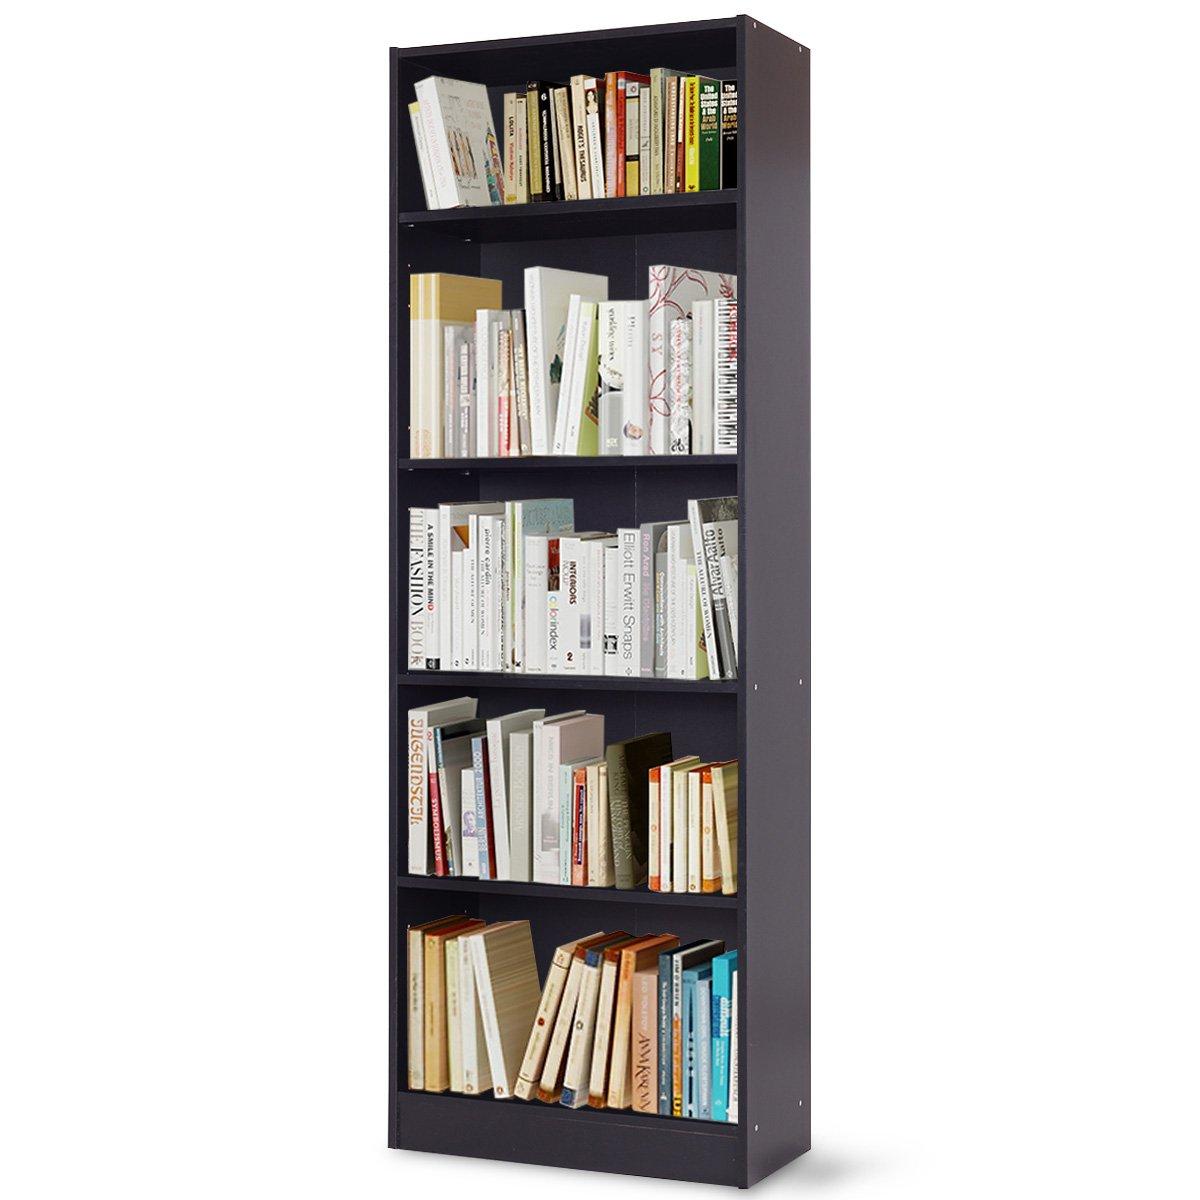 TANGKULA 5-Shelf Bookcase Modern Wood Multipurpose Collection Display Storage Shelves Black